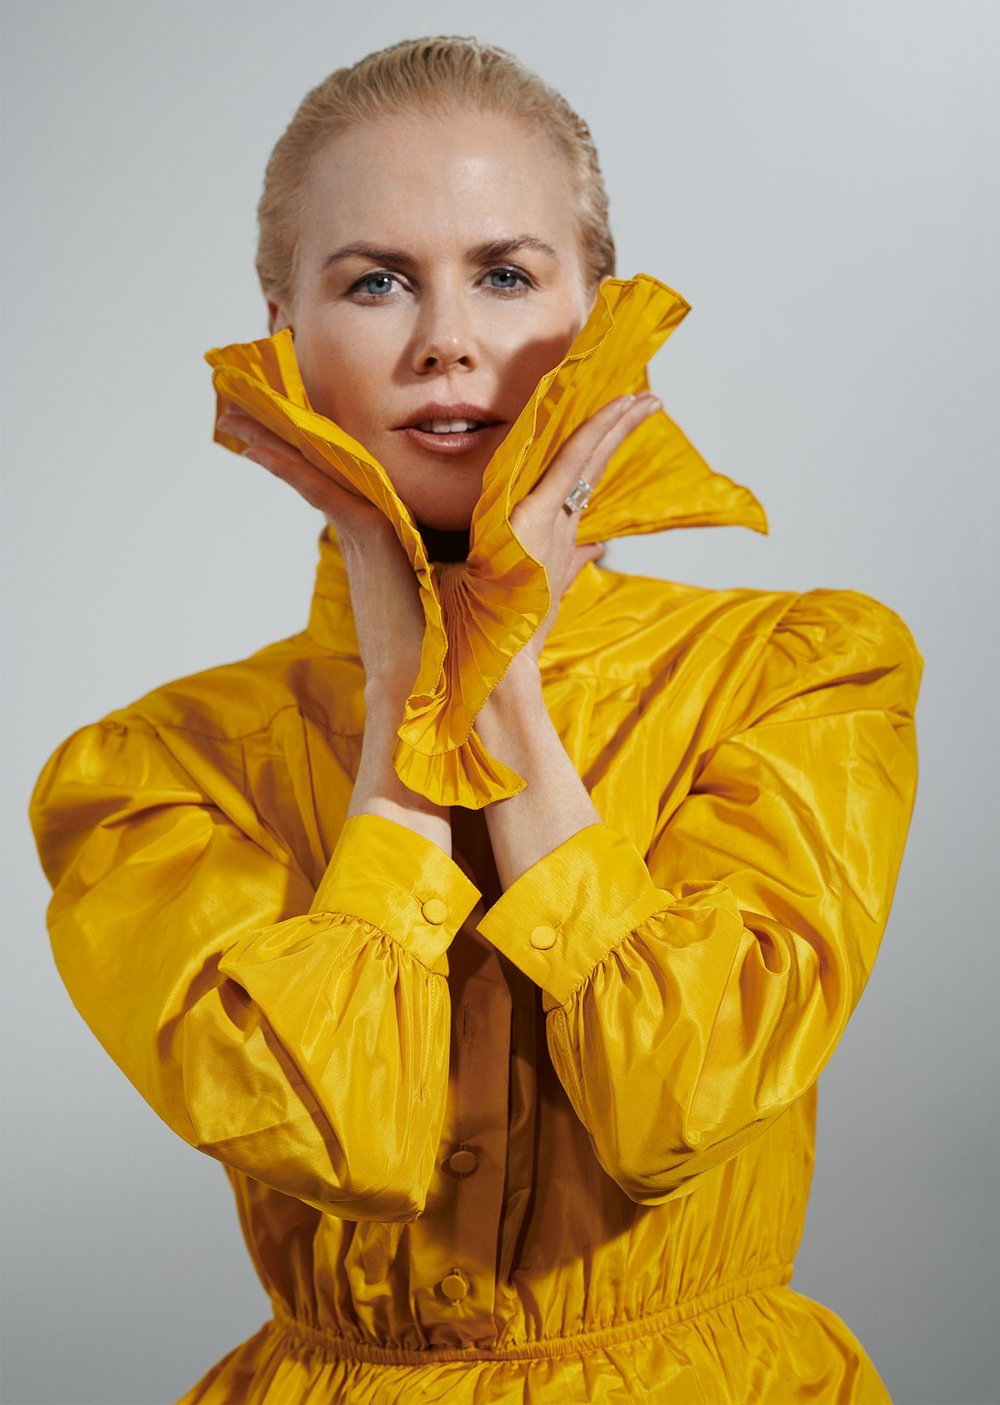 Nicole Kidman by Collier Schorr for Vanity Fair US May 2019 (10).jpg